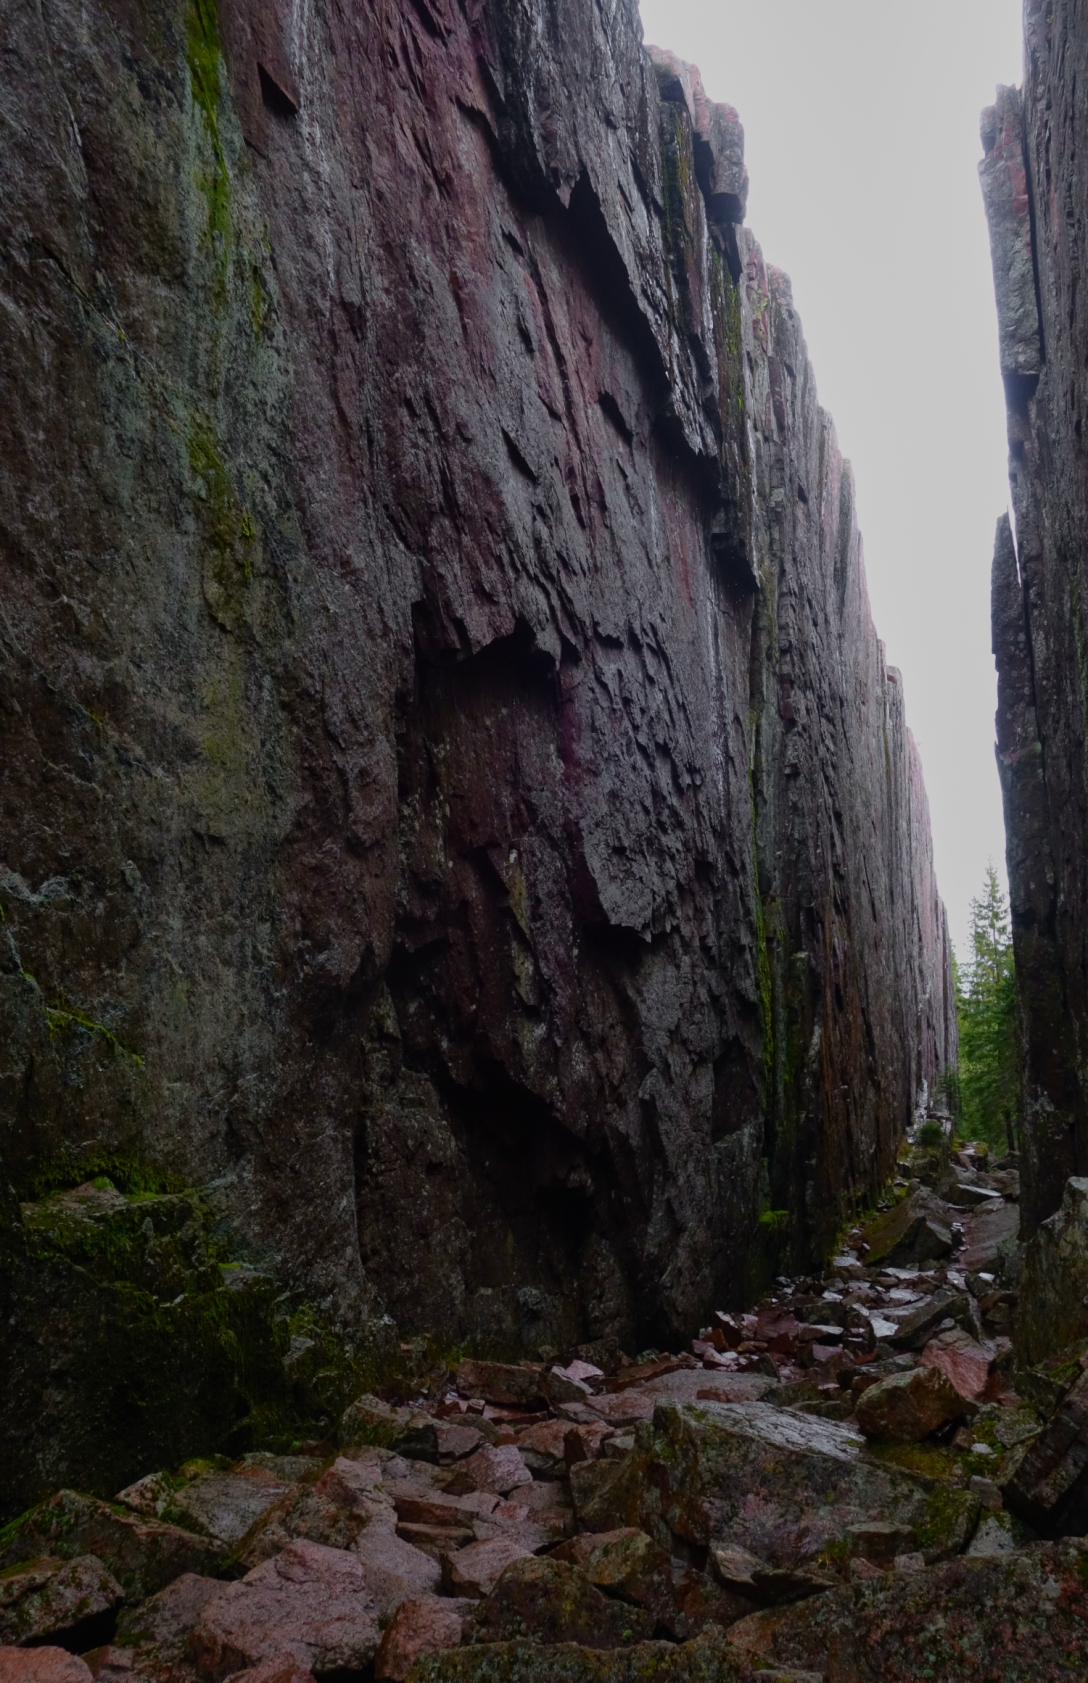 Wet cliff walls